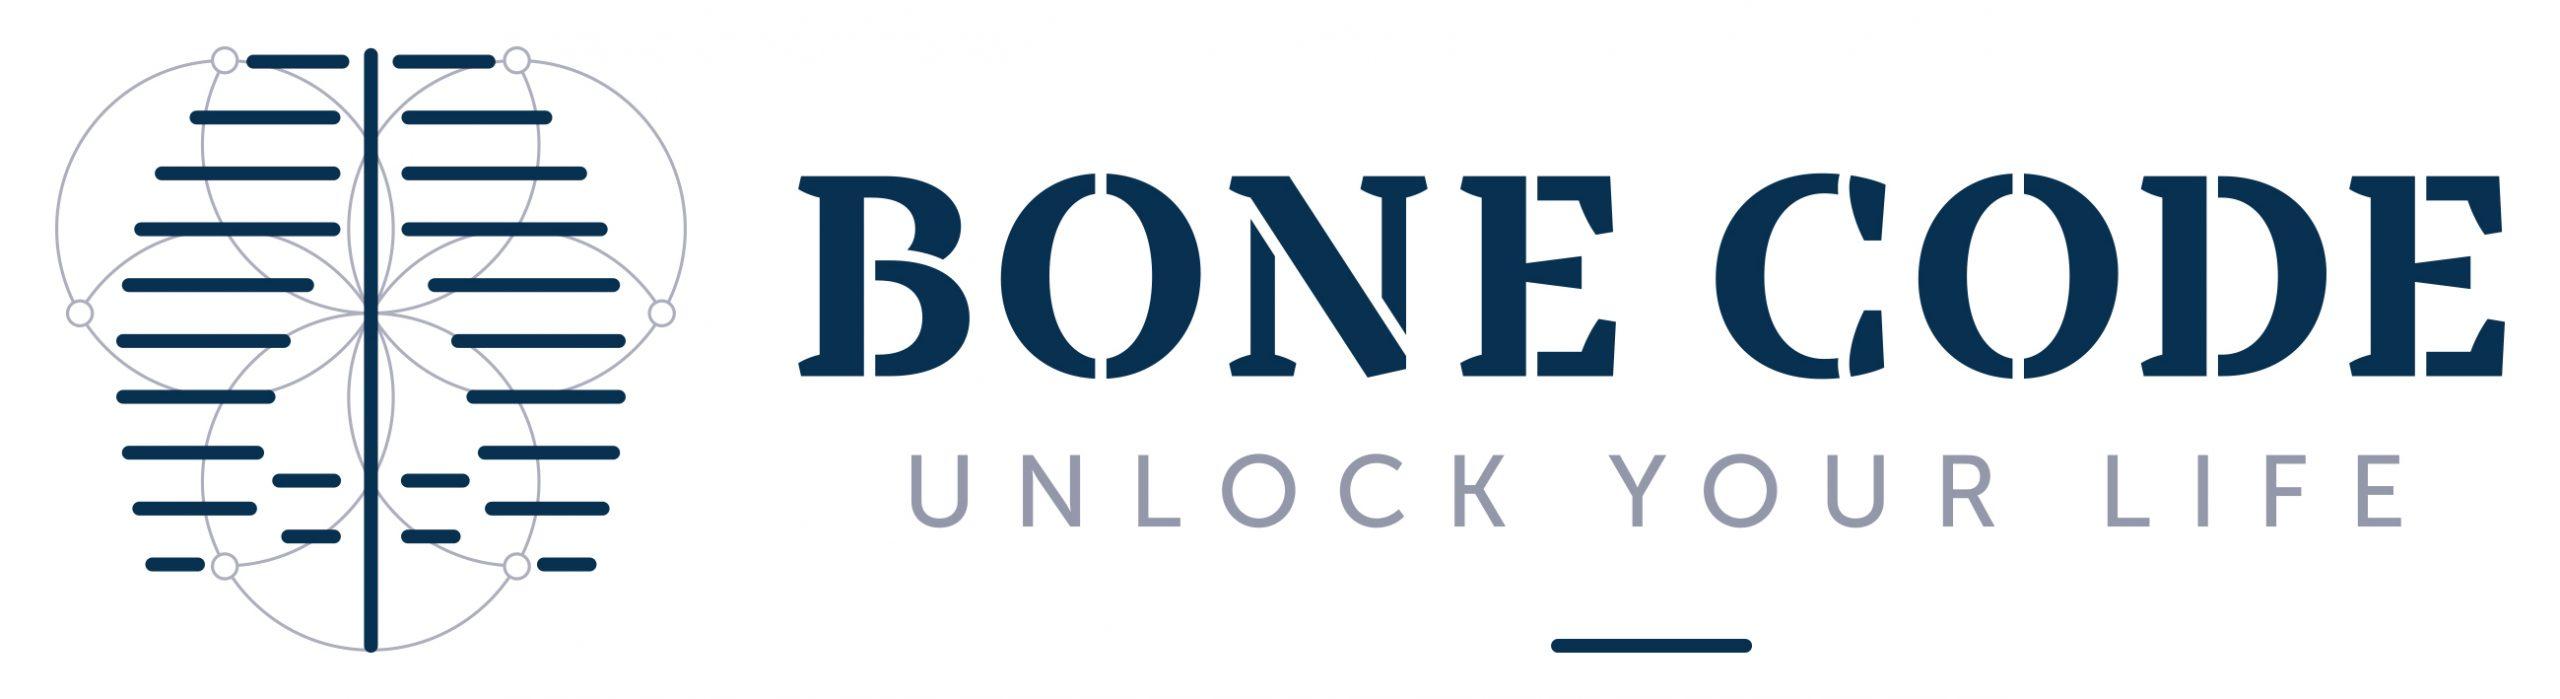 BoneCode